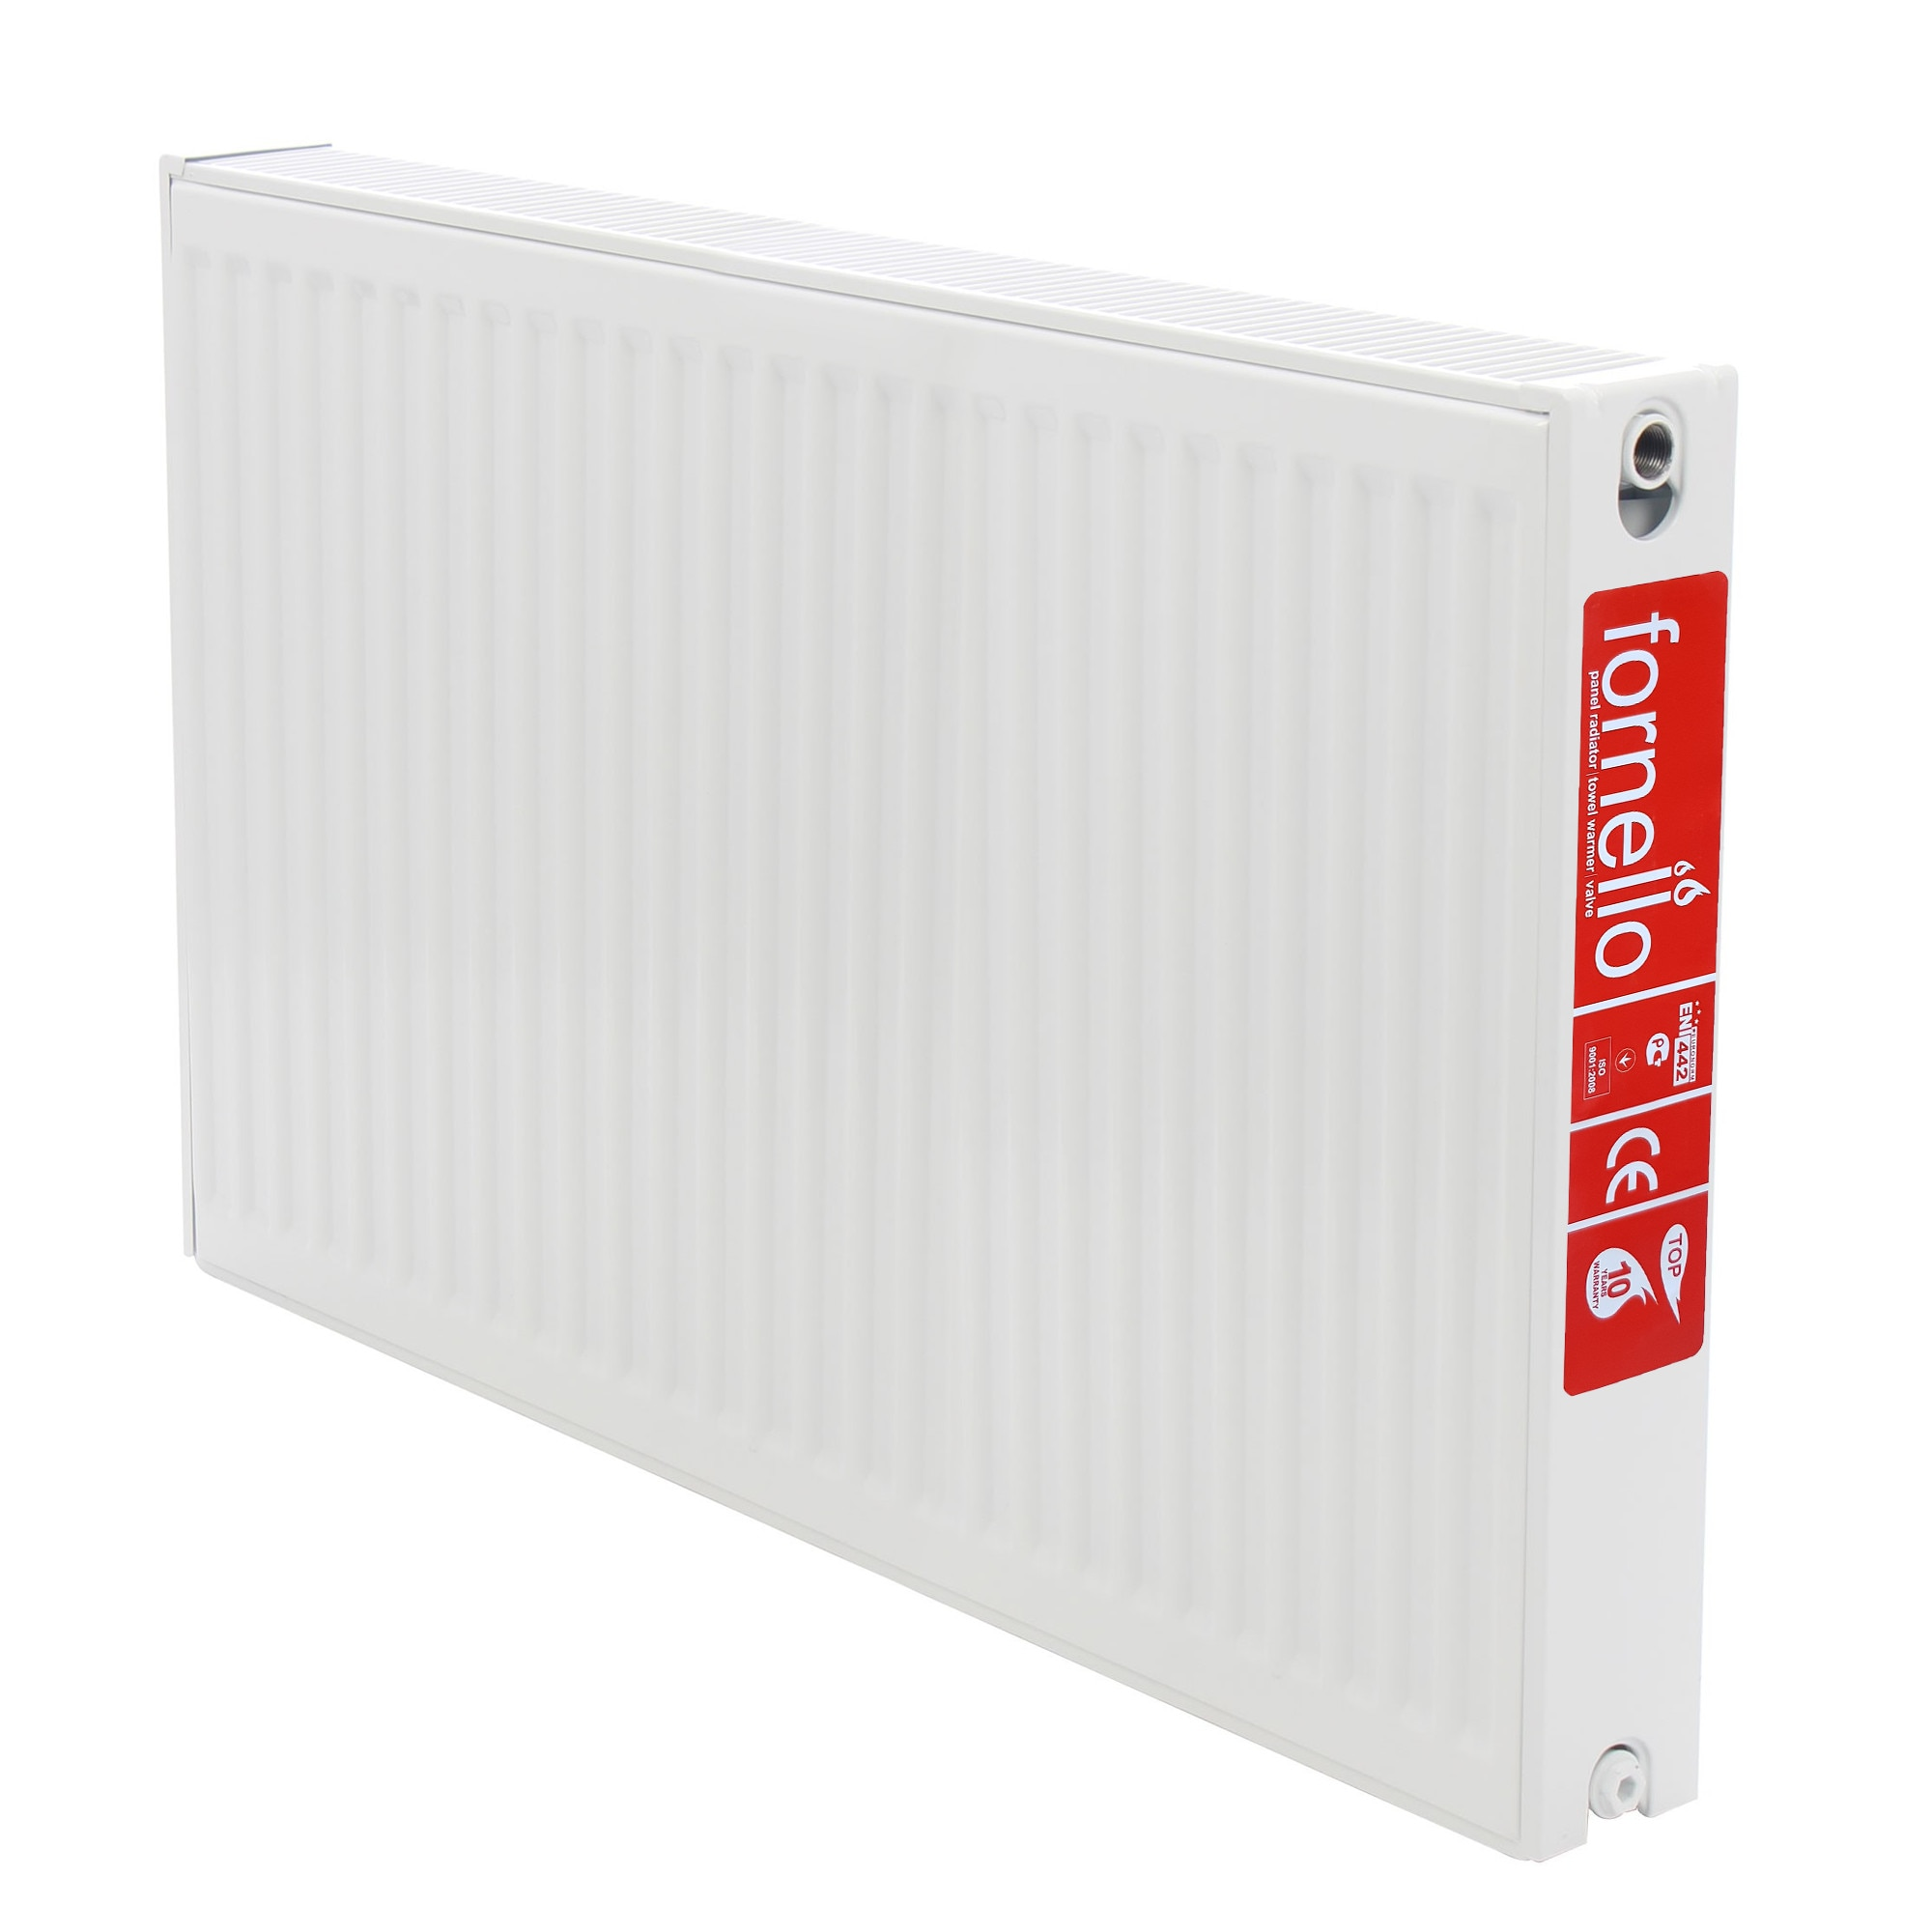 Fotografie Radiator (calorifer) Fornello, tip 22, 600x1600 mm, Otel